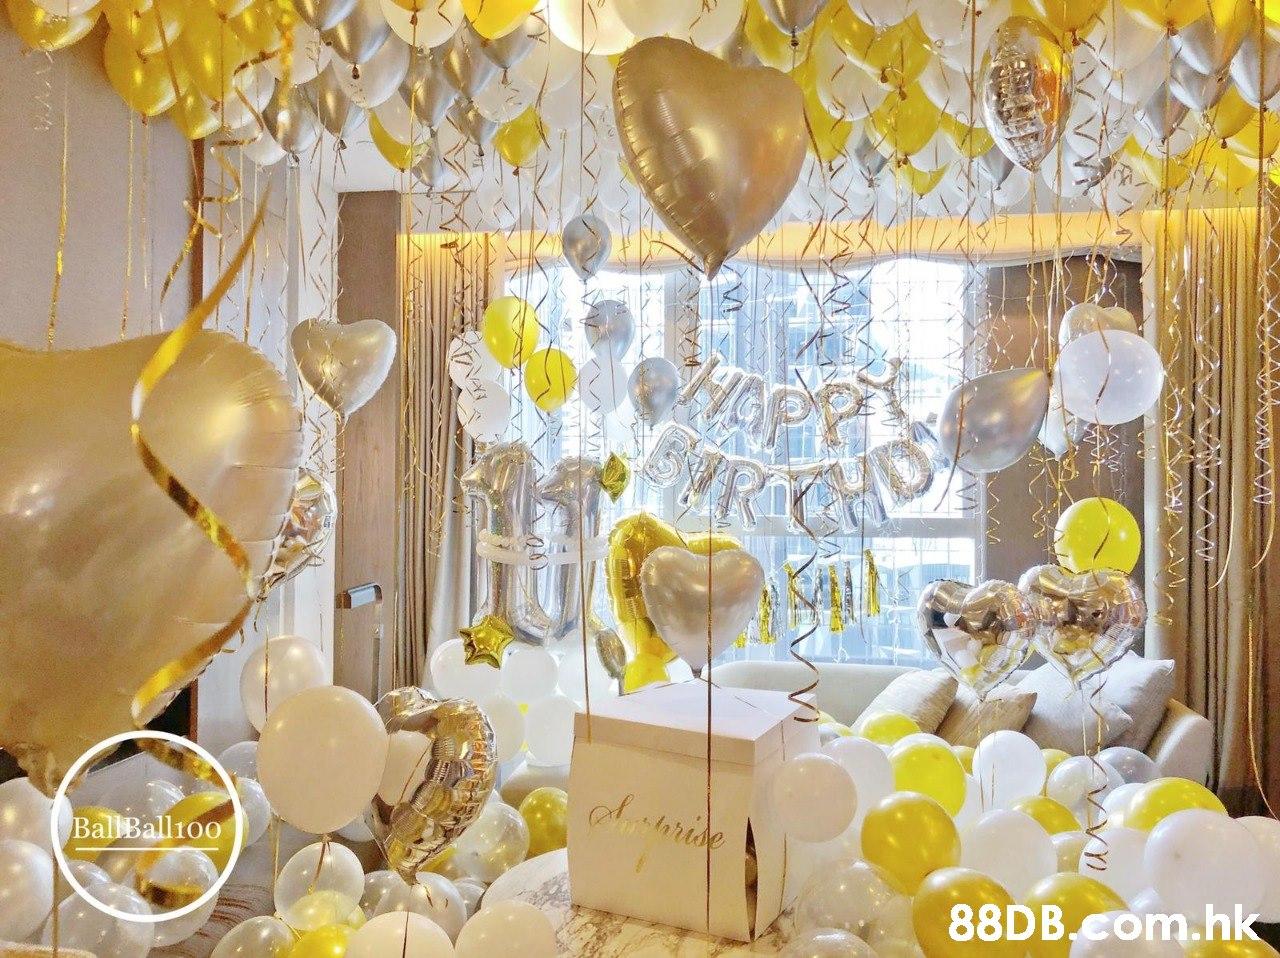 dride BallBallroo 88DBcom.hk ww A AAA  Yellow,Balloon,Decoration,Toy,Wallpaper